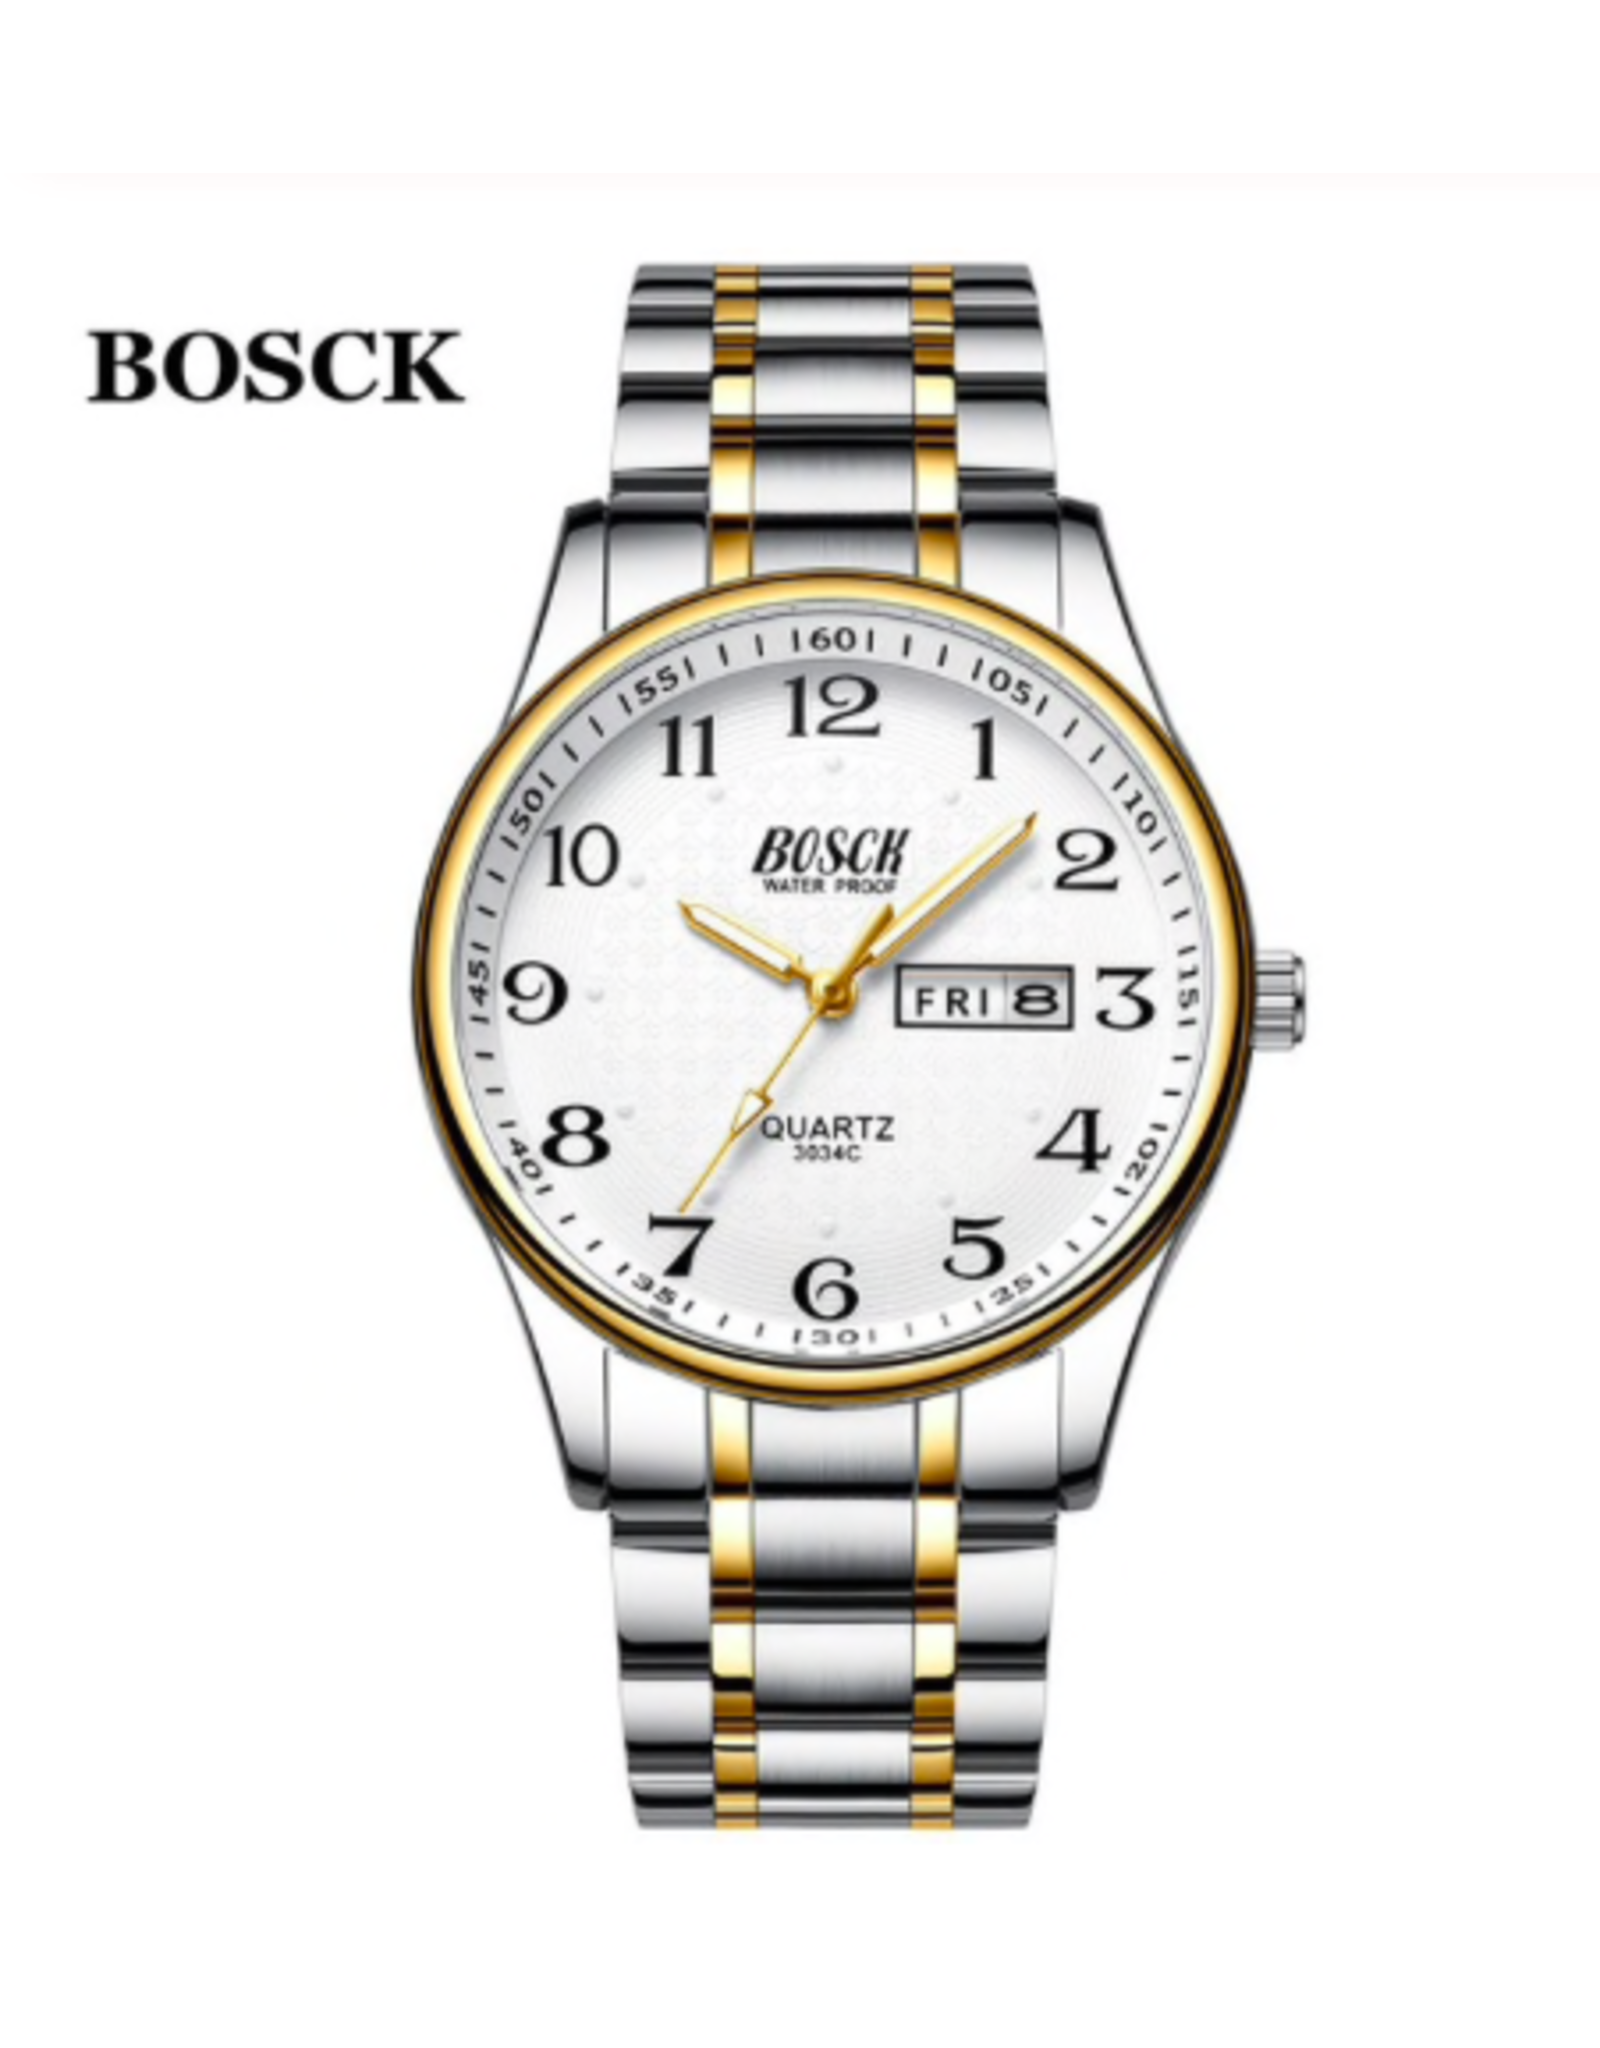 Bosk Deux tons, fond blanc, date